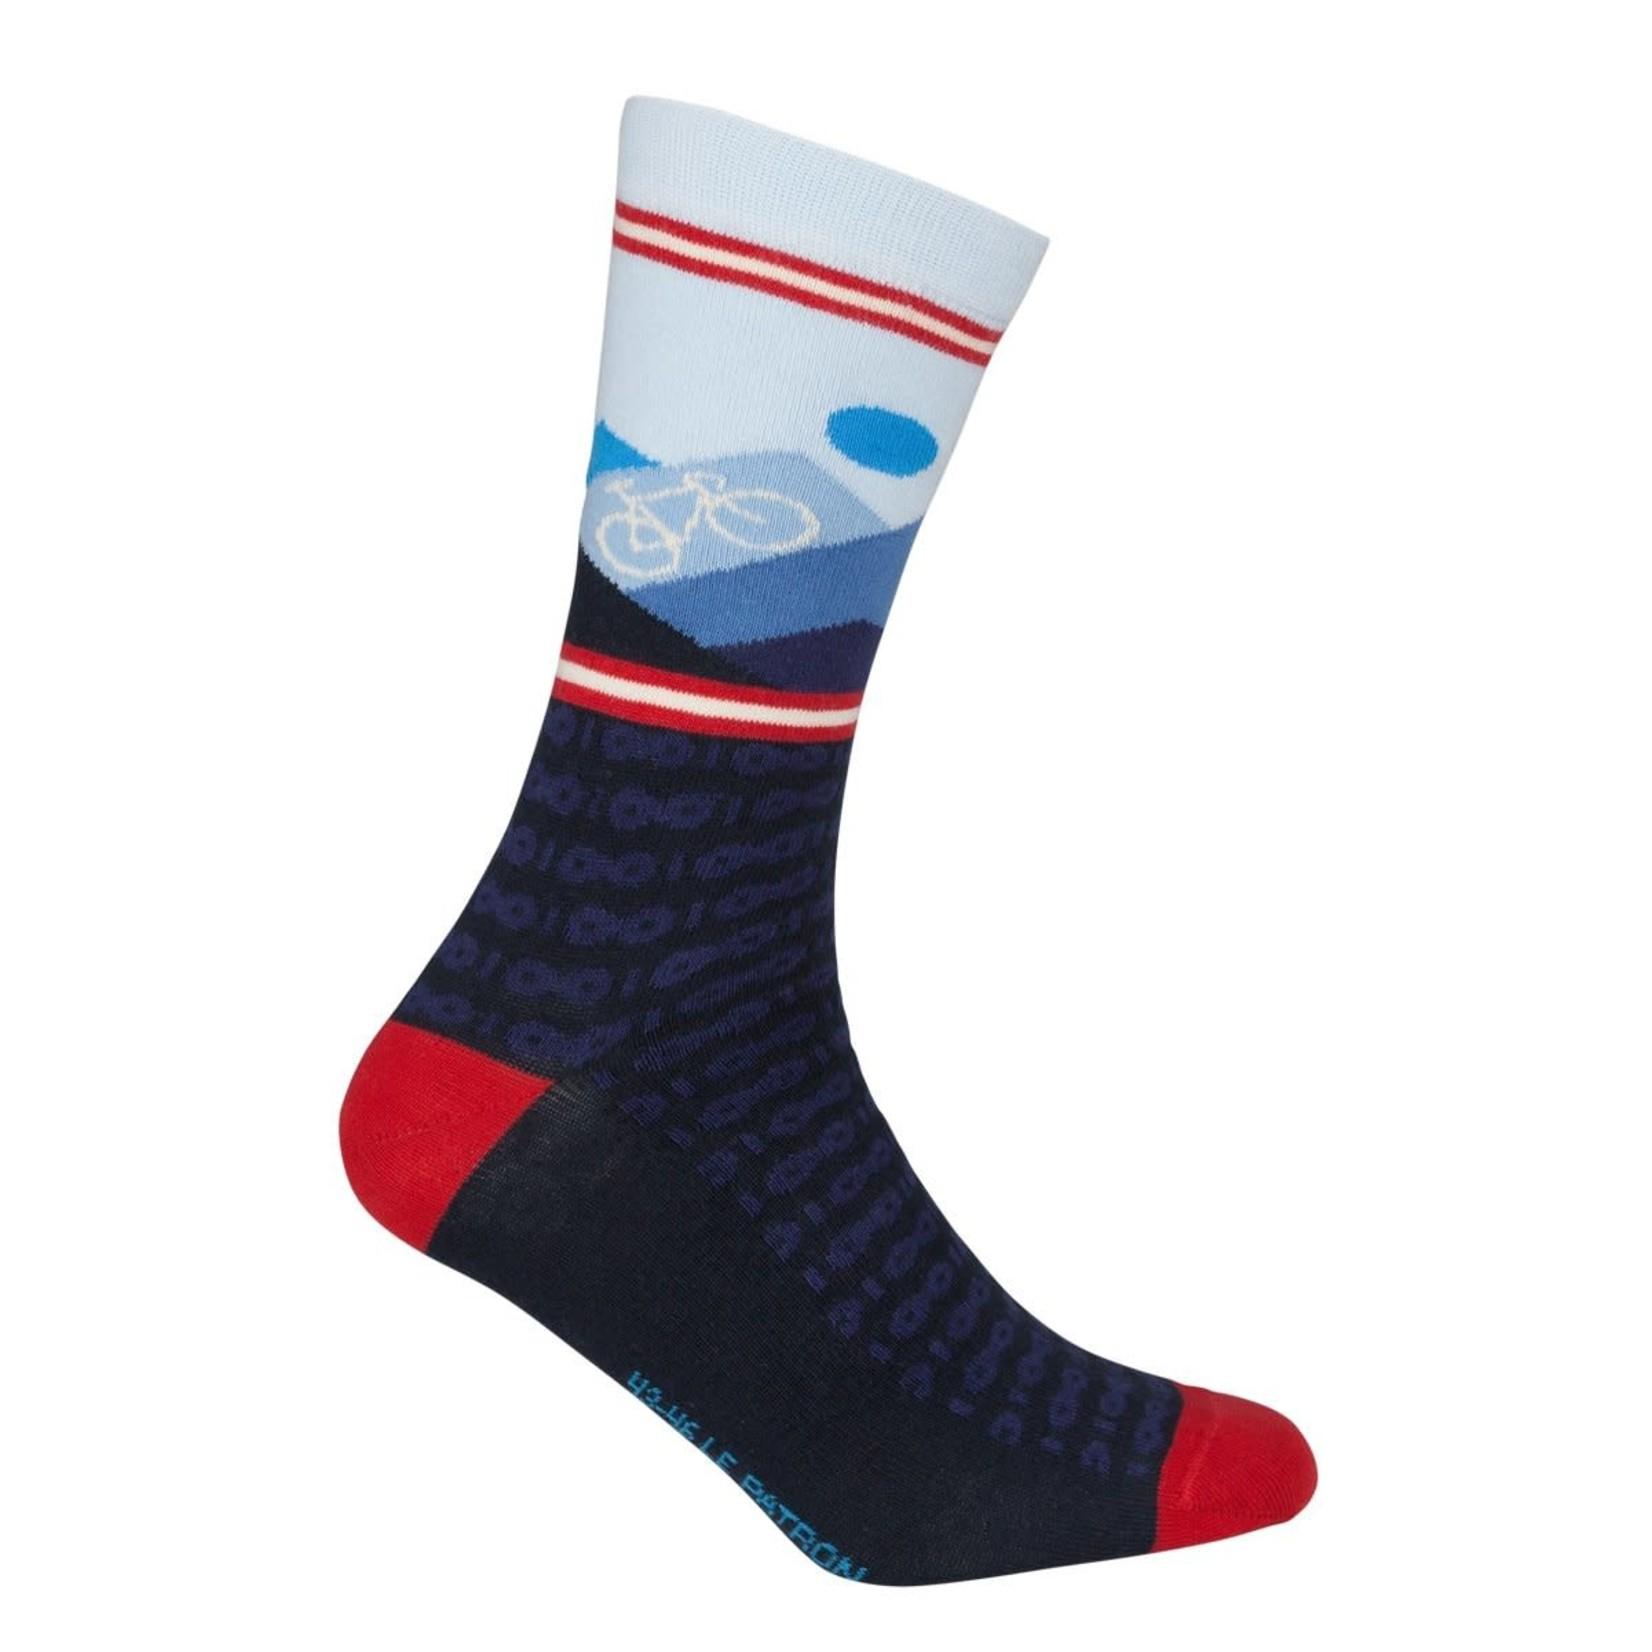 Sokken 'Le Patron' Mountain socks donkerblauw